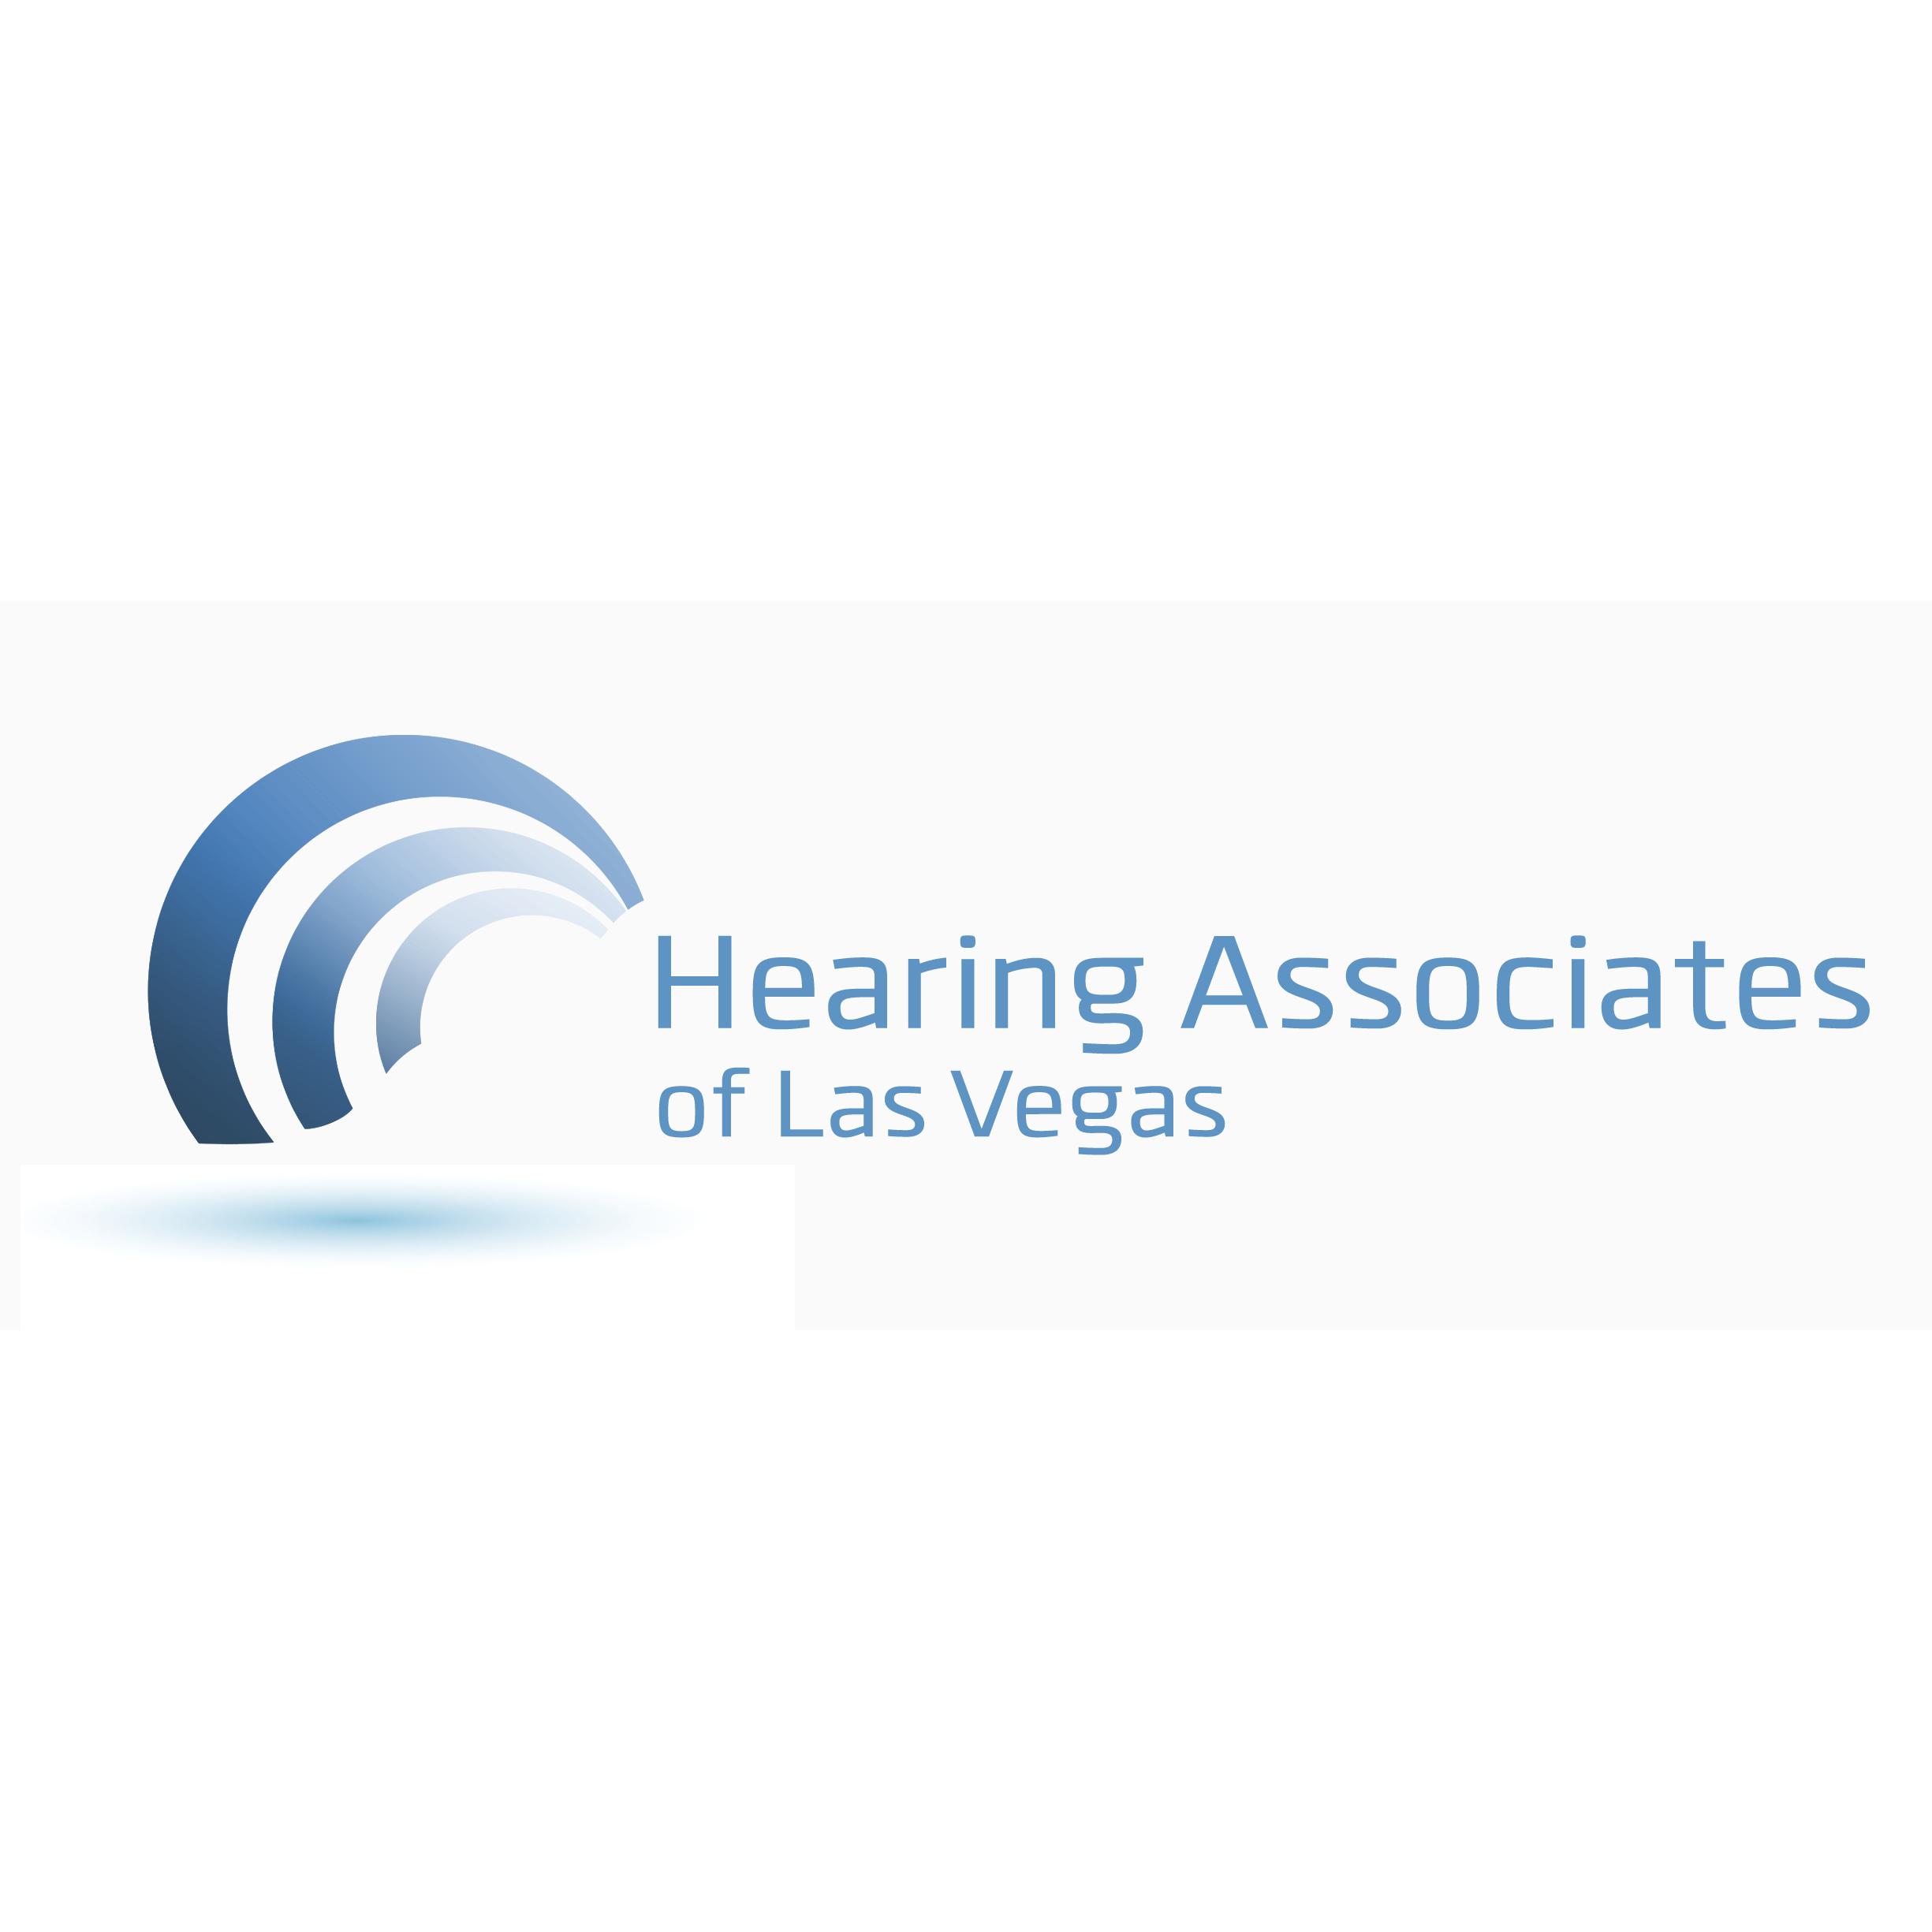 Hearing Associates of Las Vegas